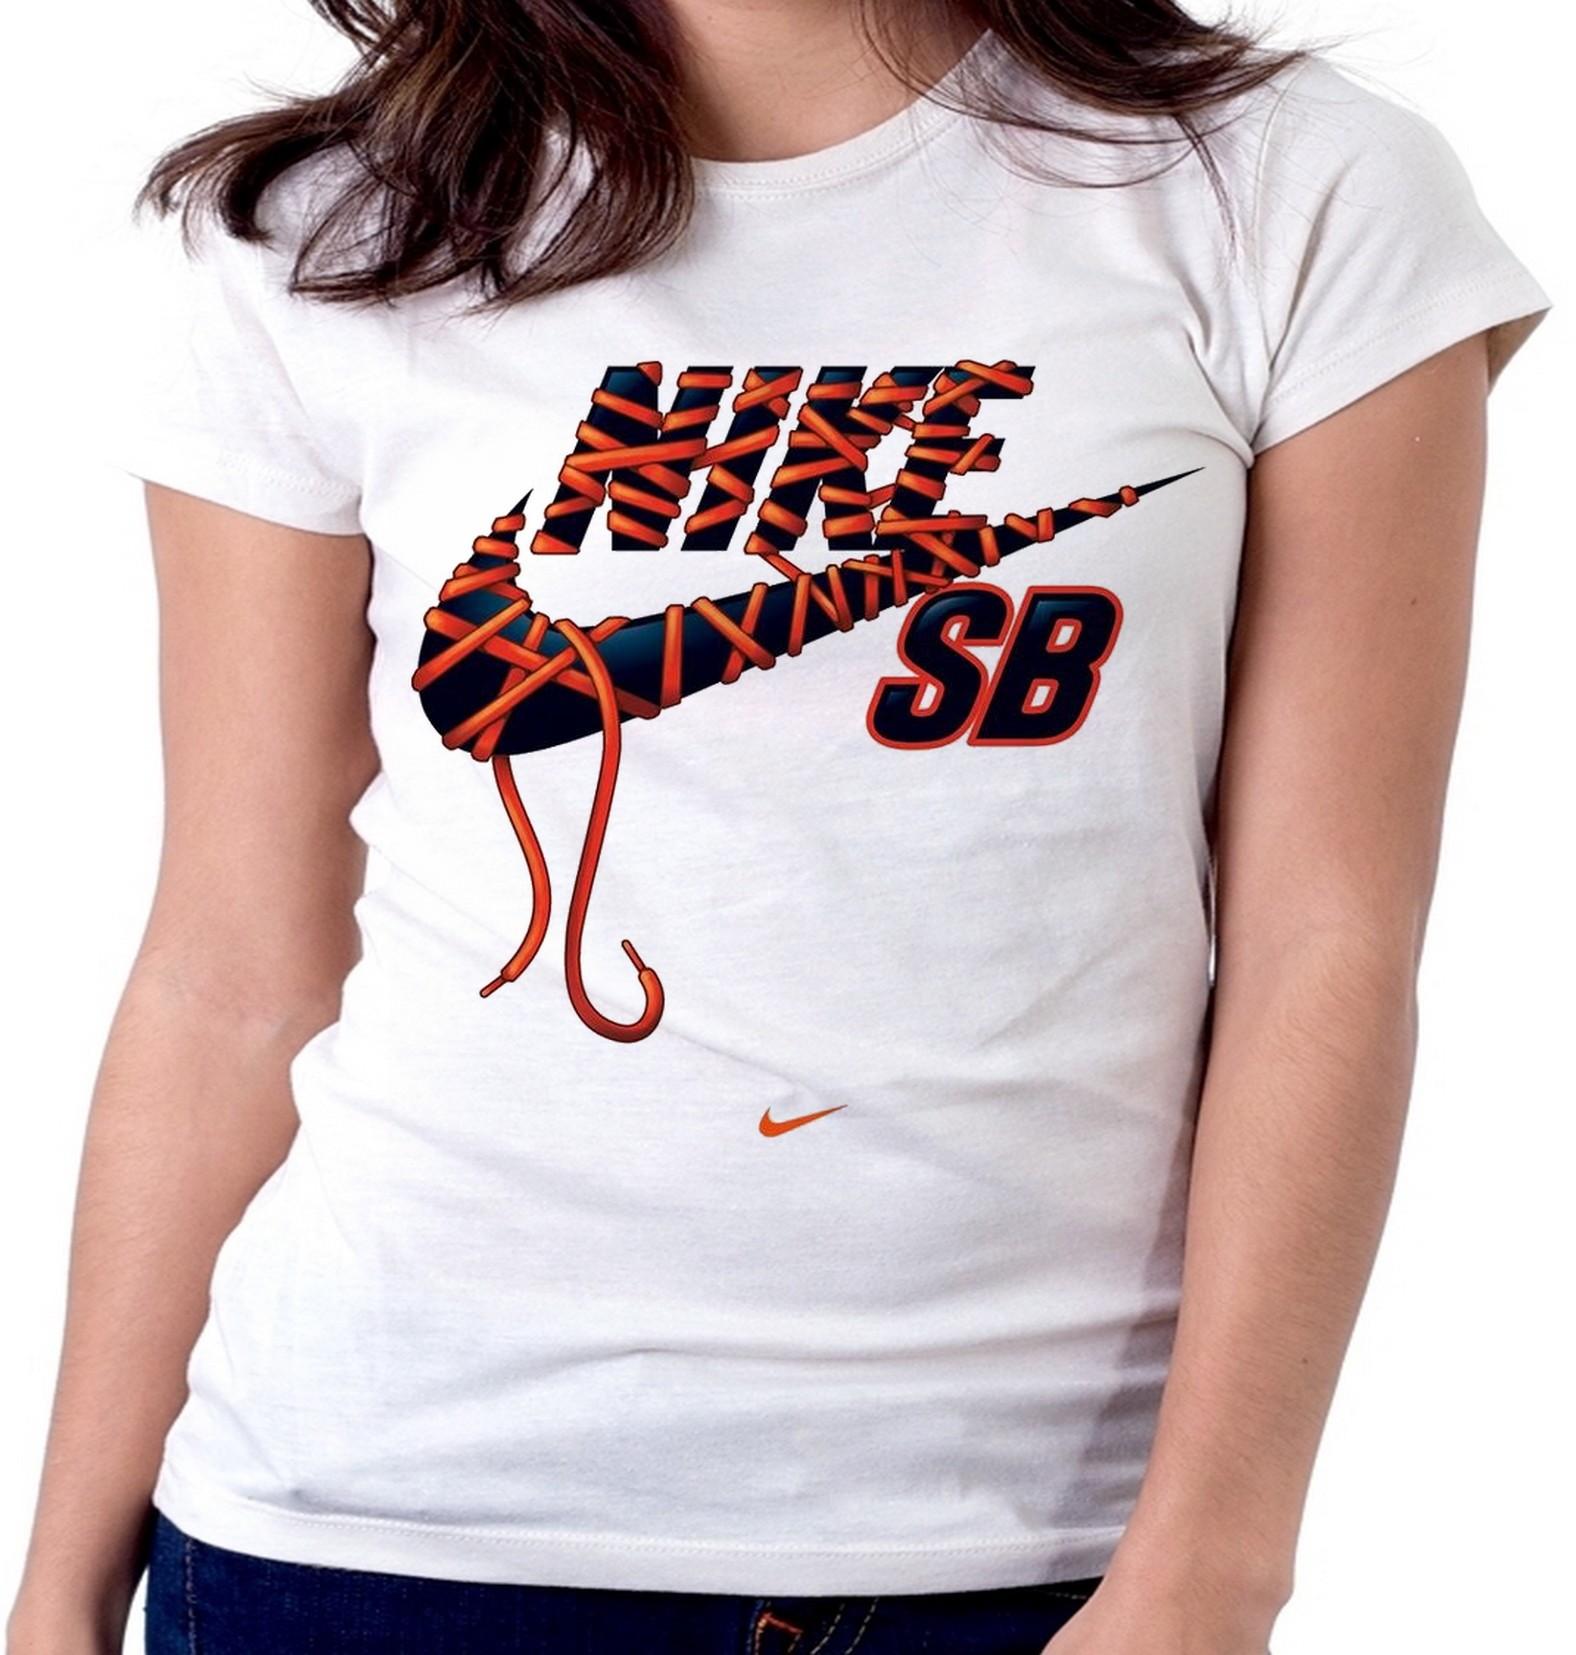 d1e44132ae0eb Camiseta Nike Sb